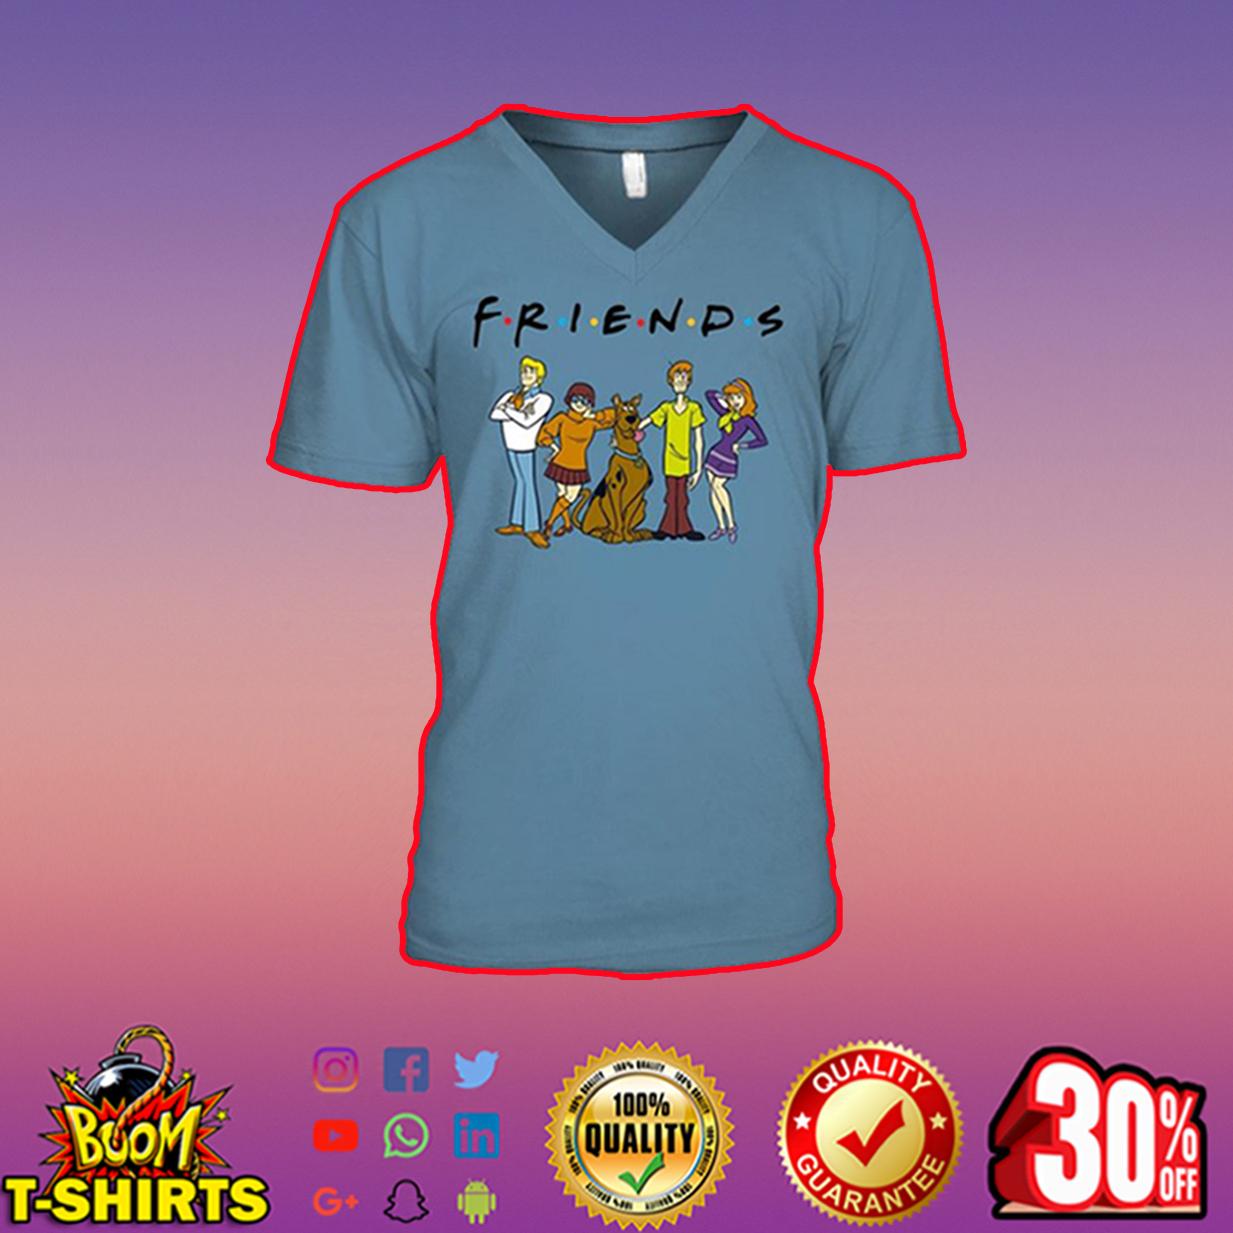 Scooby Doo Friends v-neck